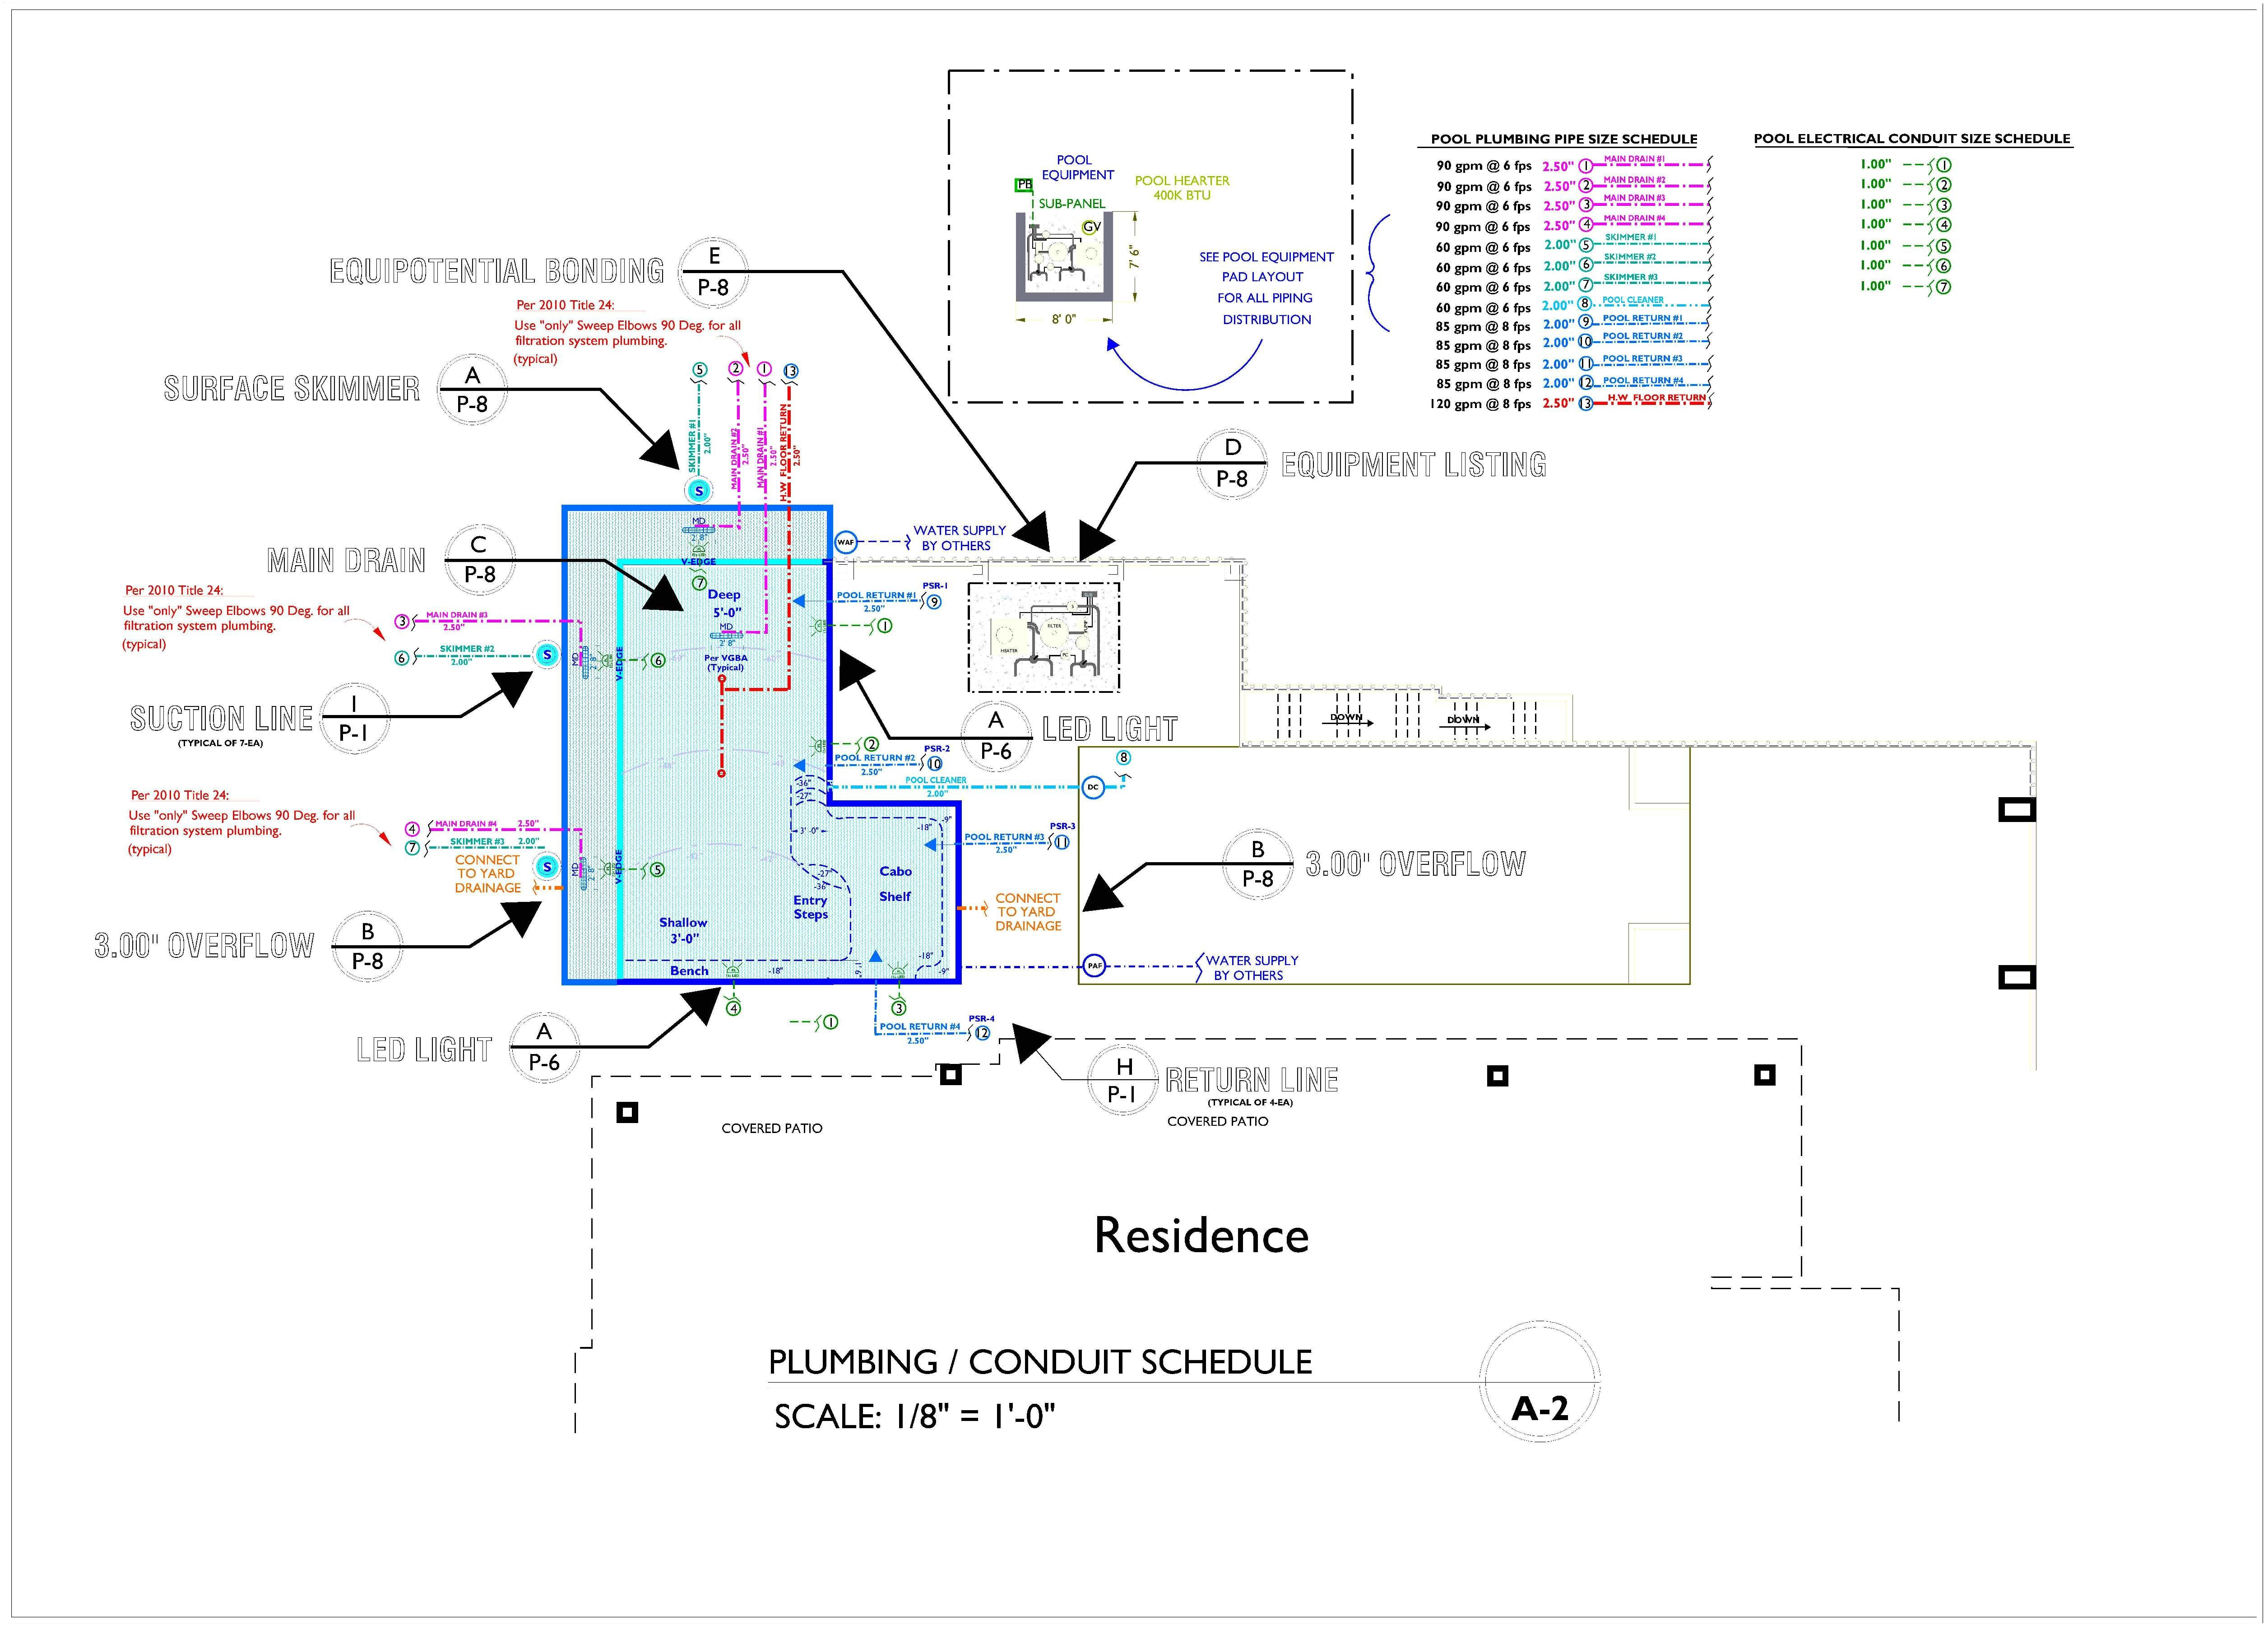 Sheet P 2 Swimming Pool Plumbing Electrical Aquatic Mechanical